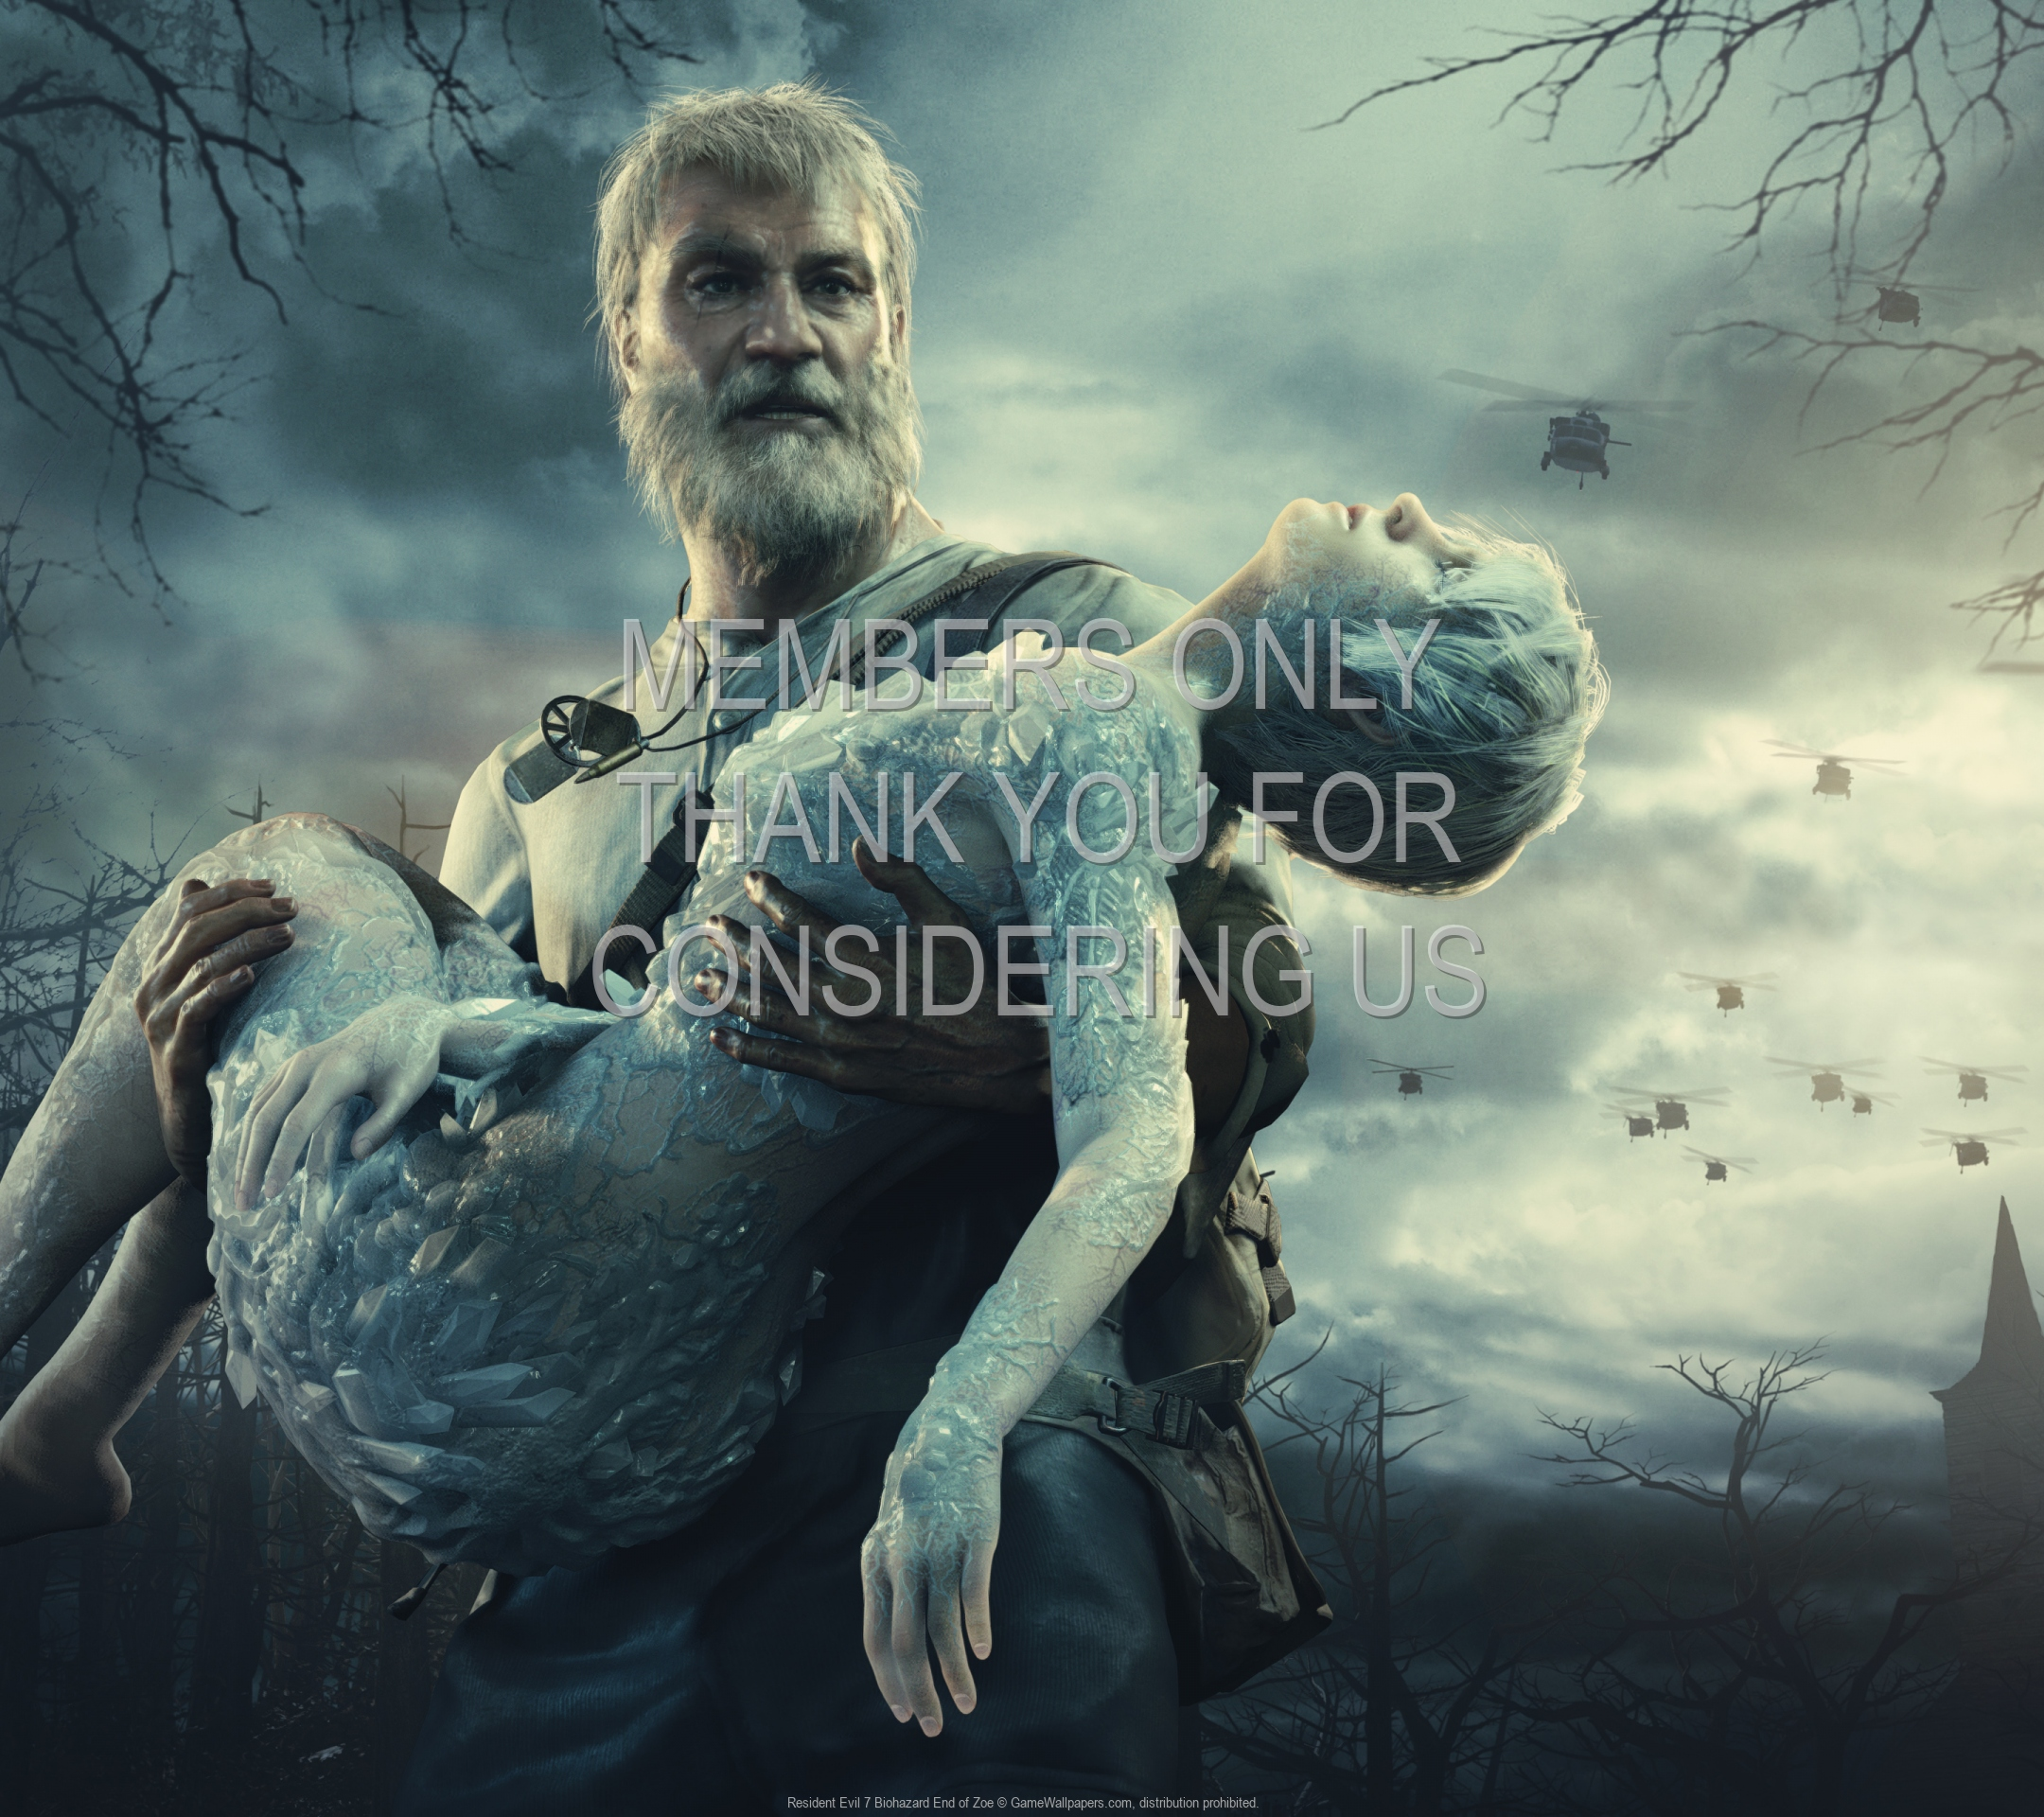 Resident Evil 7 Biohazard: End of Zoe 1920x1080 Mobile fond d'écran 01